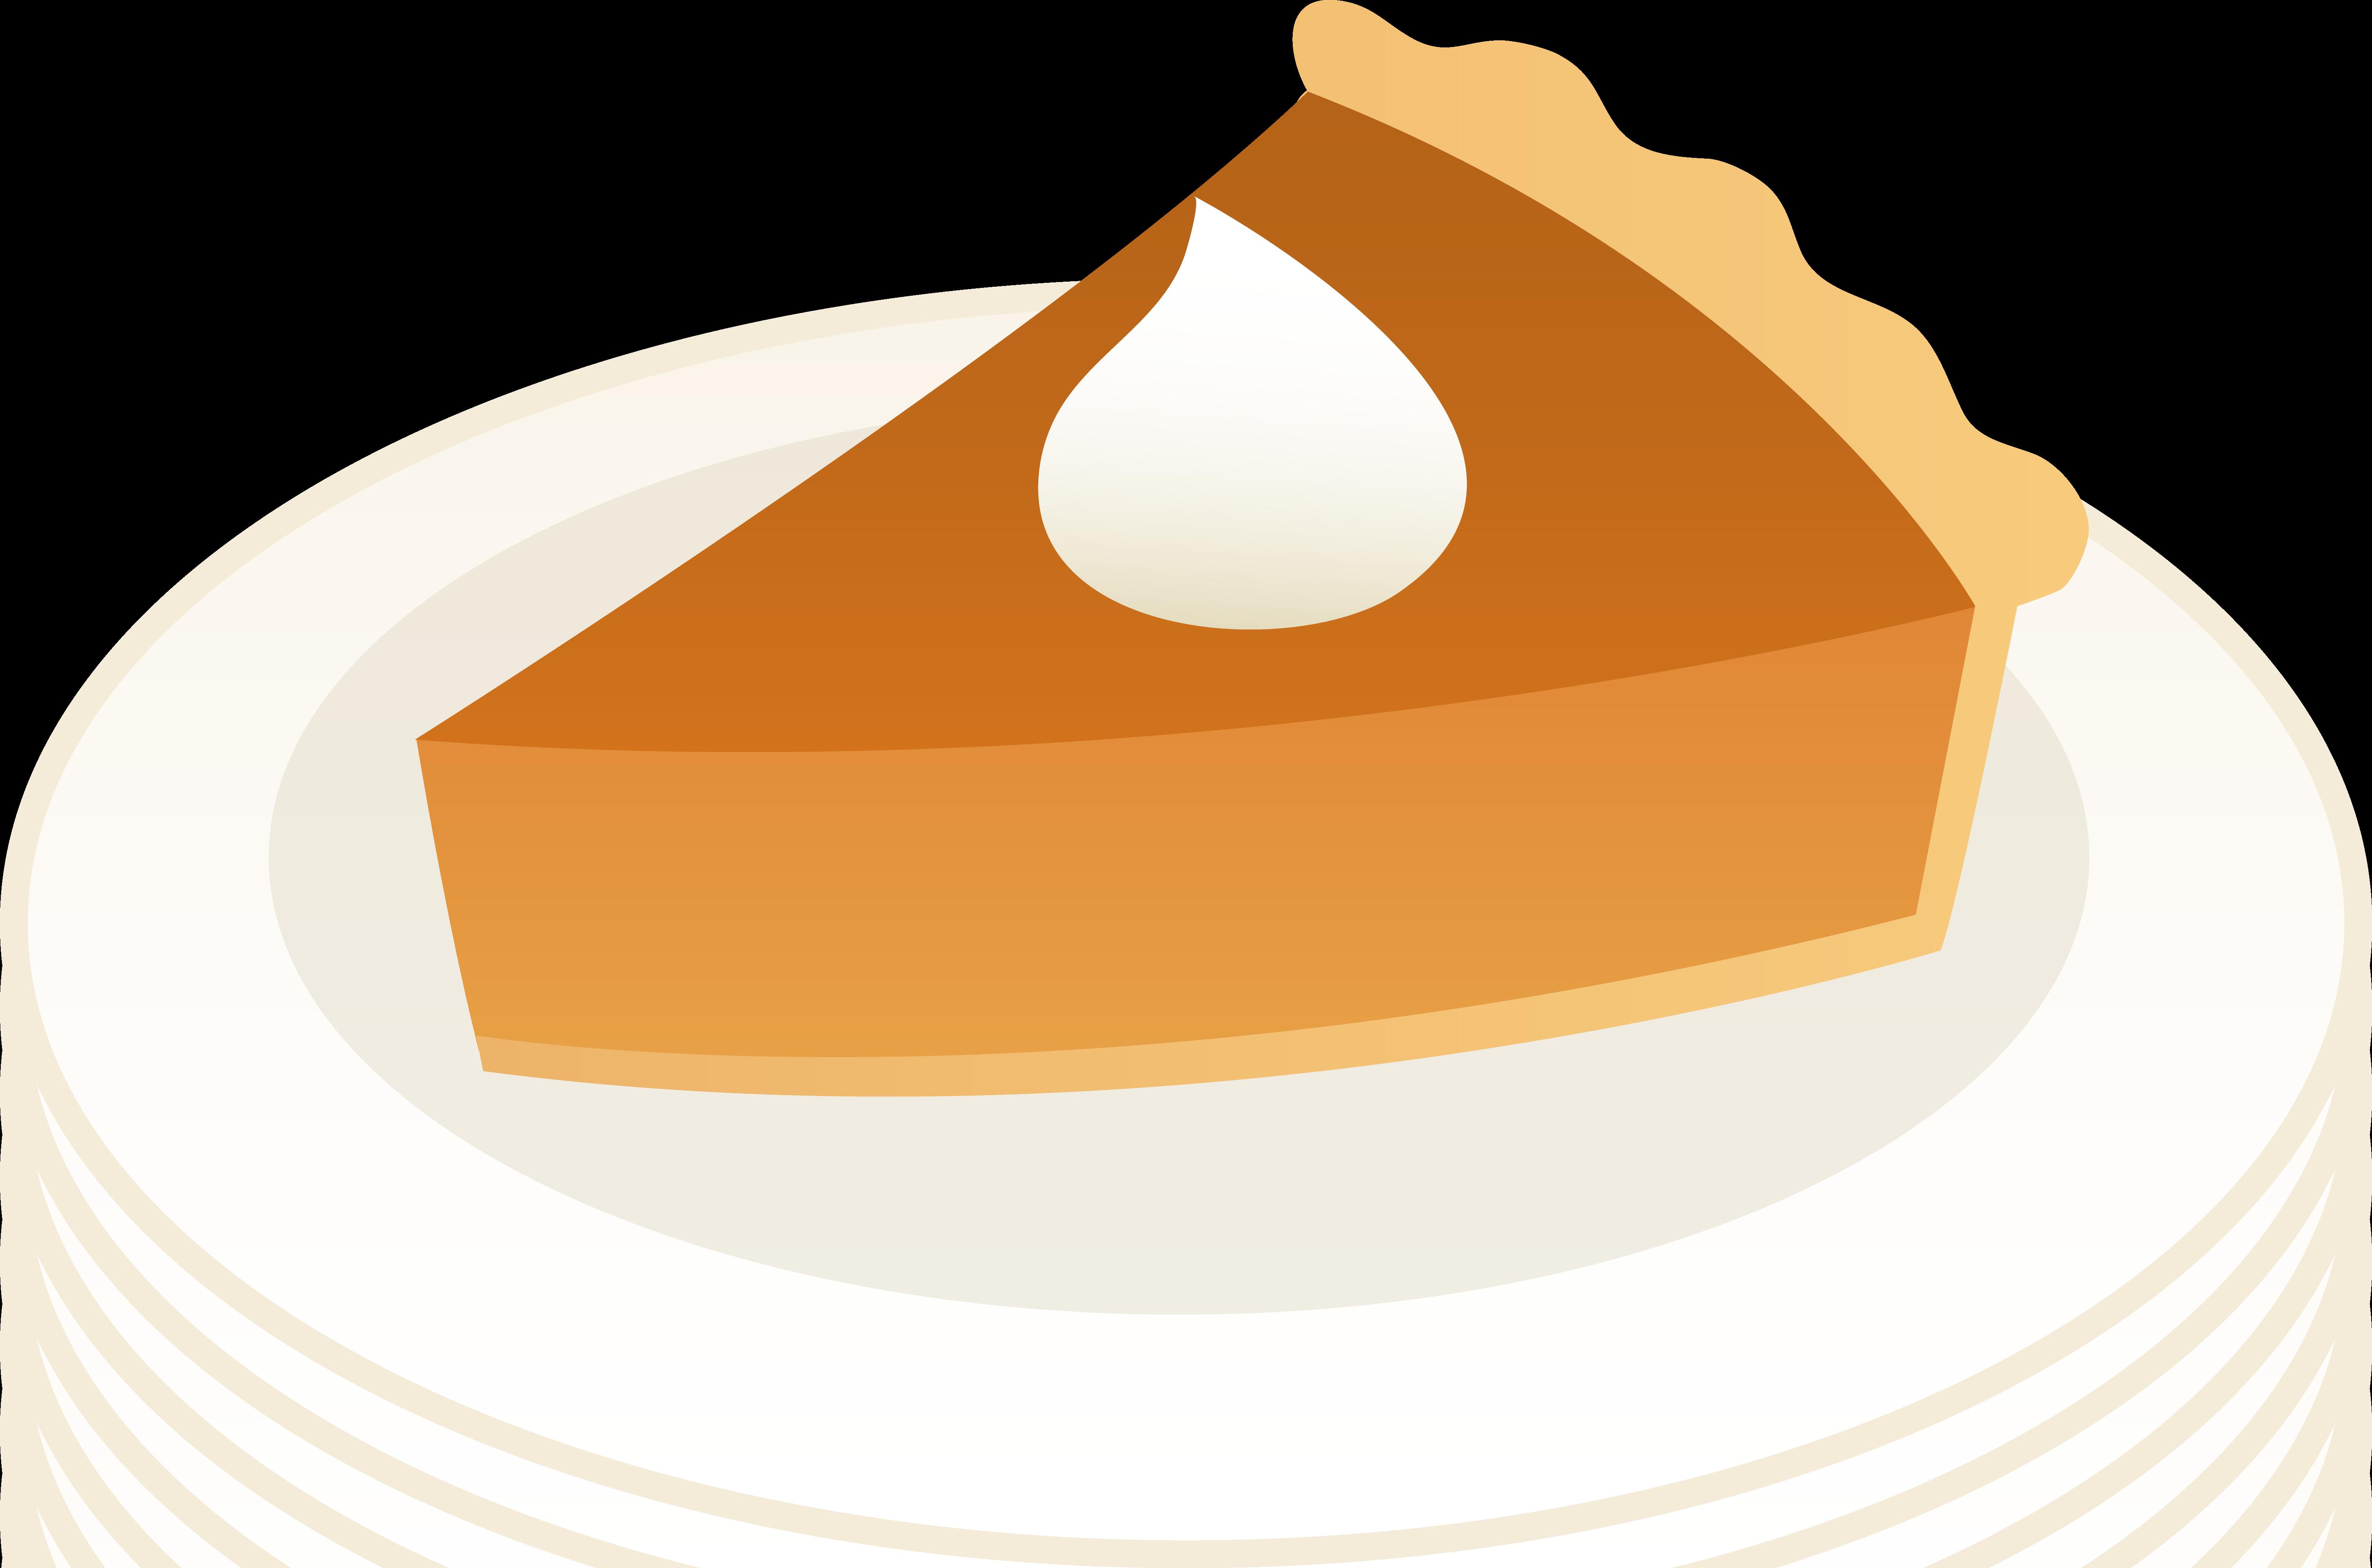 Pie clipart pumpkin pie, Pie pumpkin pie Transparent FREE.